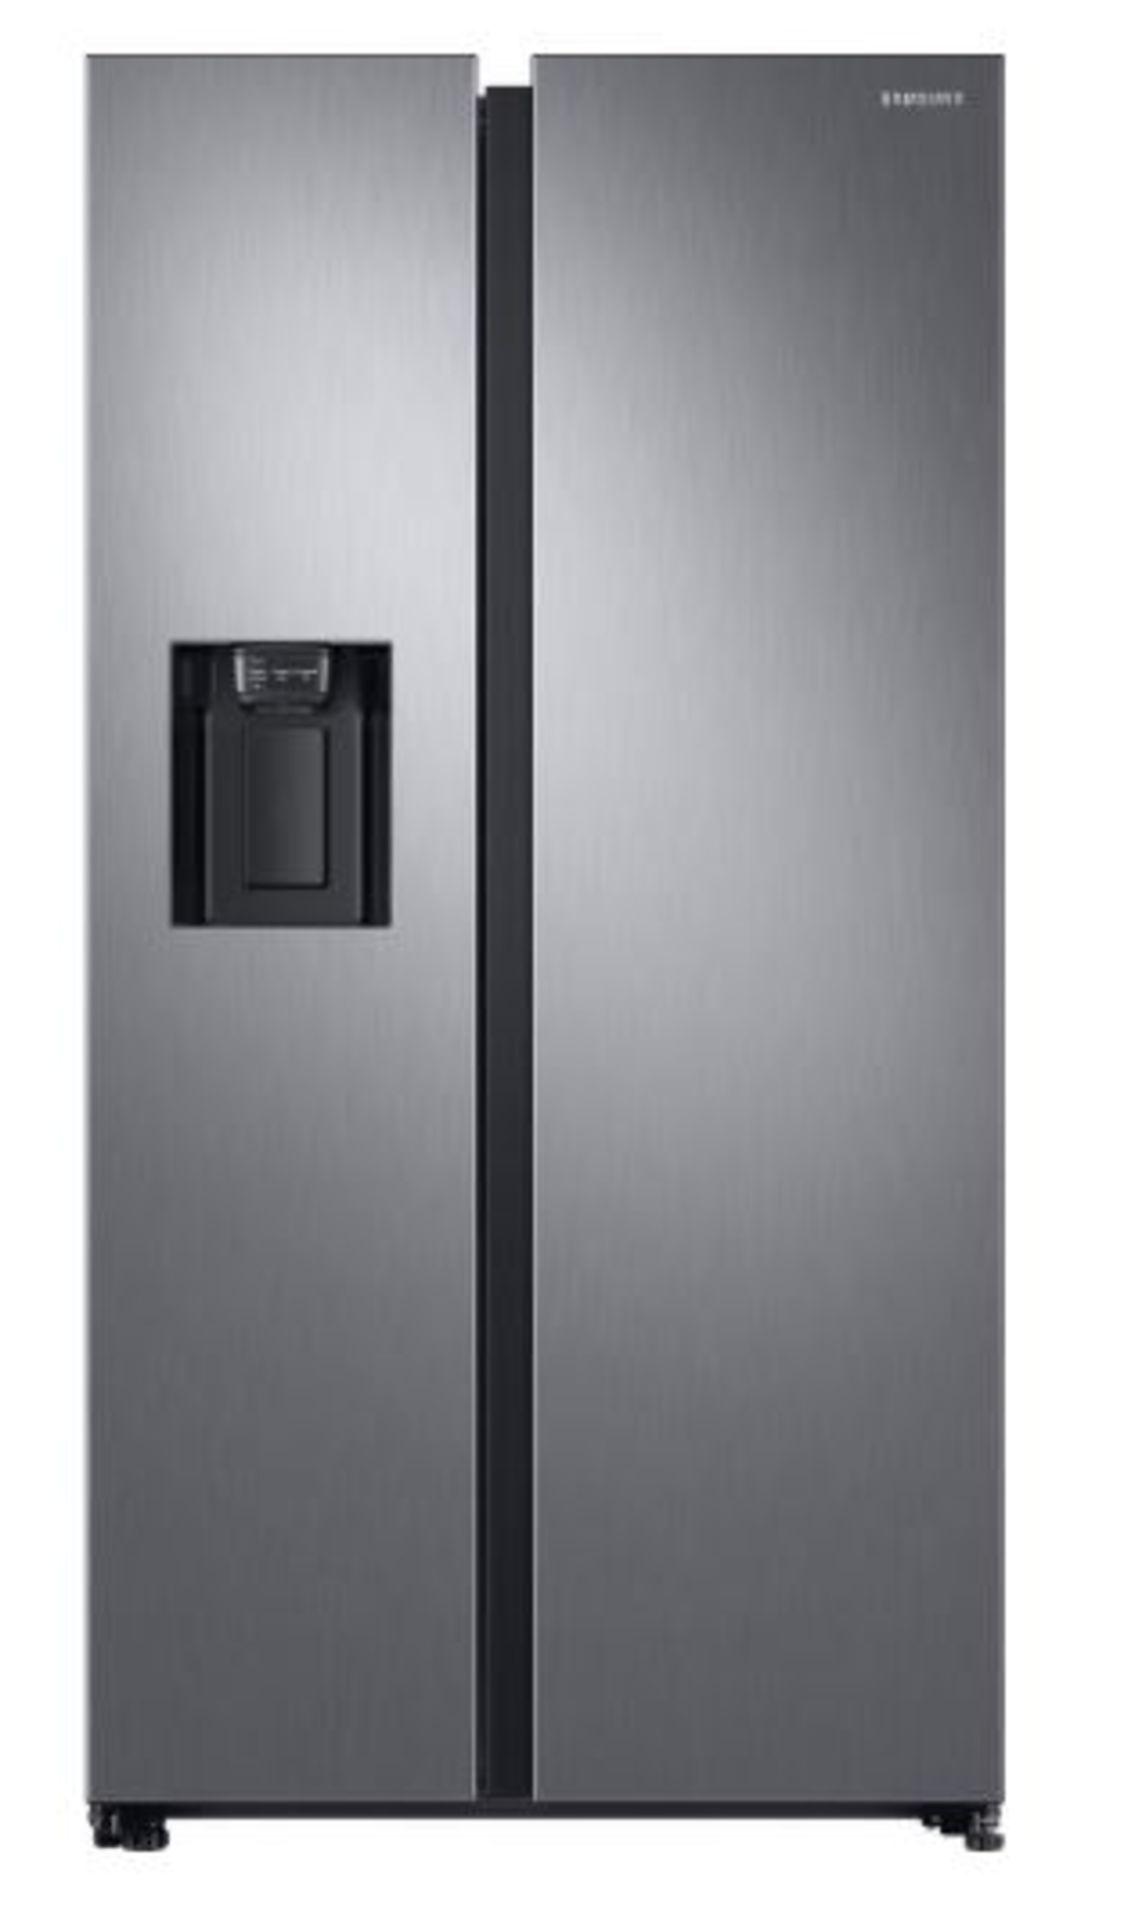 Pallet of 1 Samsung Water & Ice Fridge freezer. Latest selling price £1,329.99*